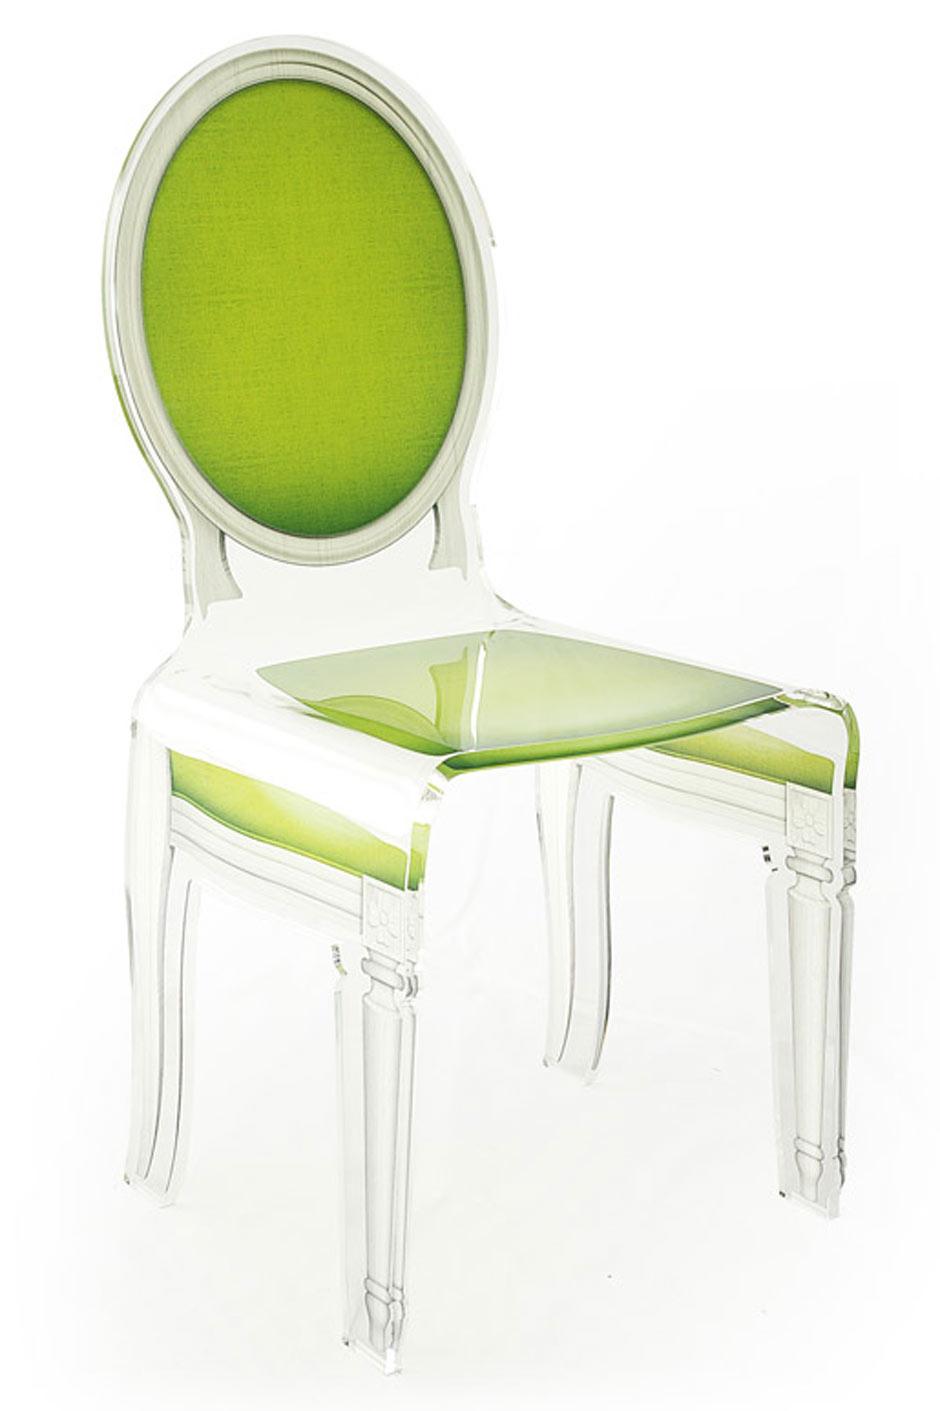 chaise baroque plexiglas sixteen motif vert anis acrila sp cialiste du plexiglas r f 11030391. Black Bedroom Furniture Sets. Home Design Ideas